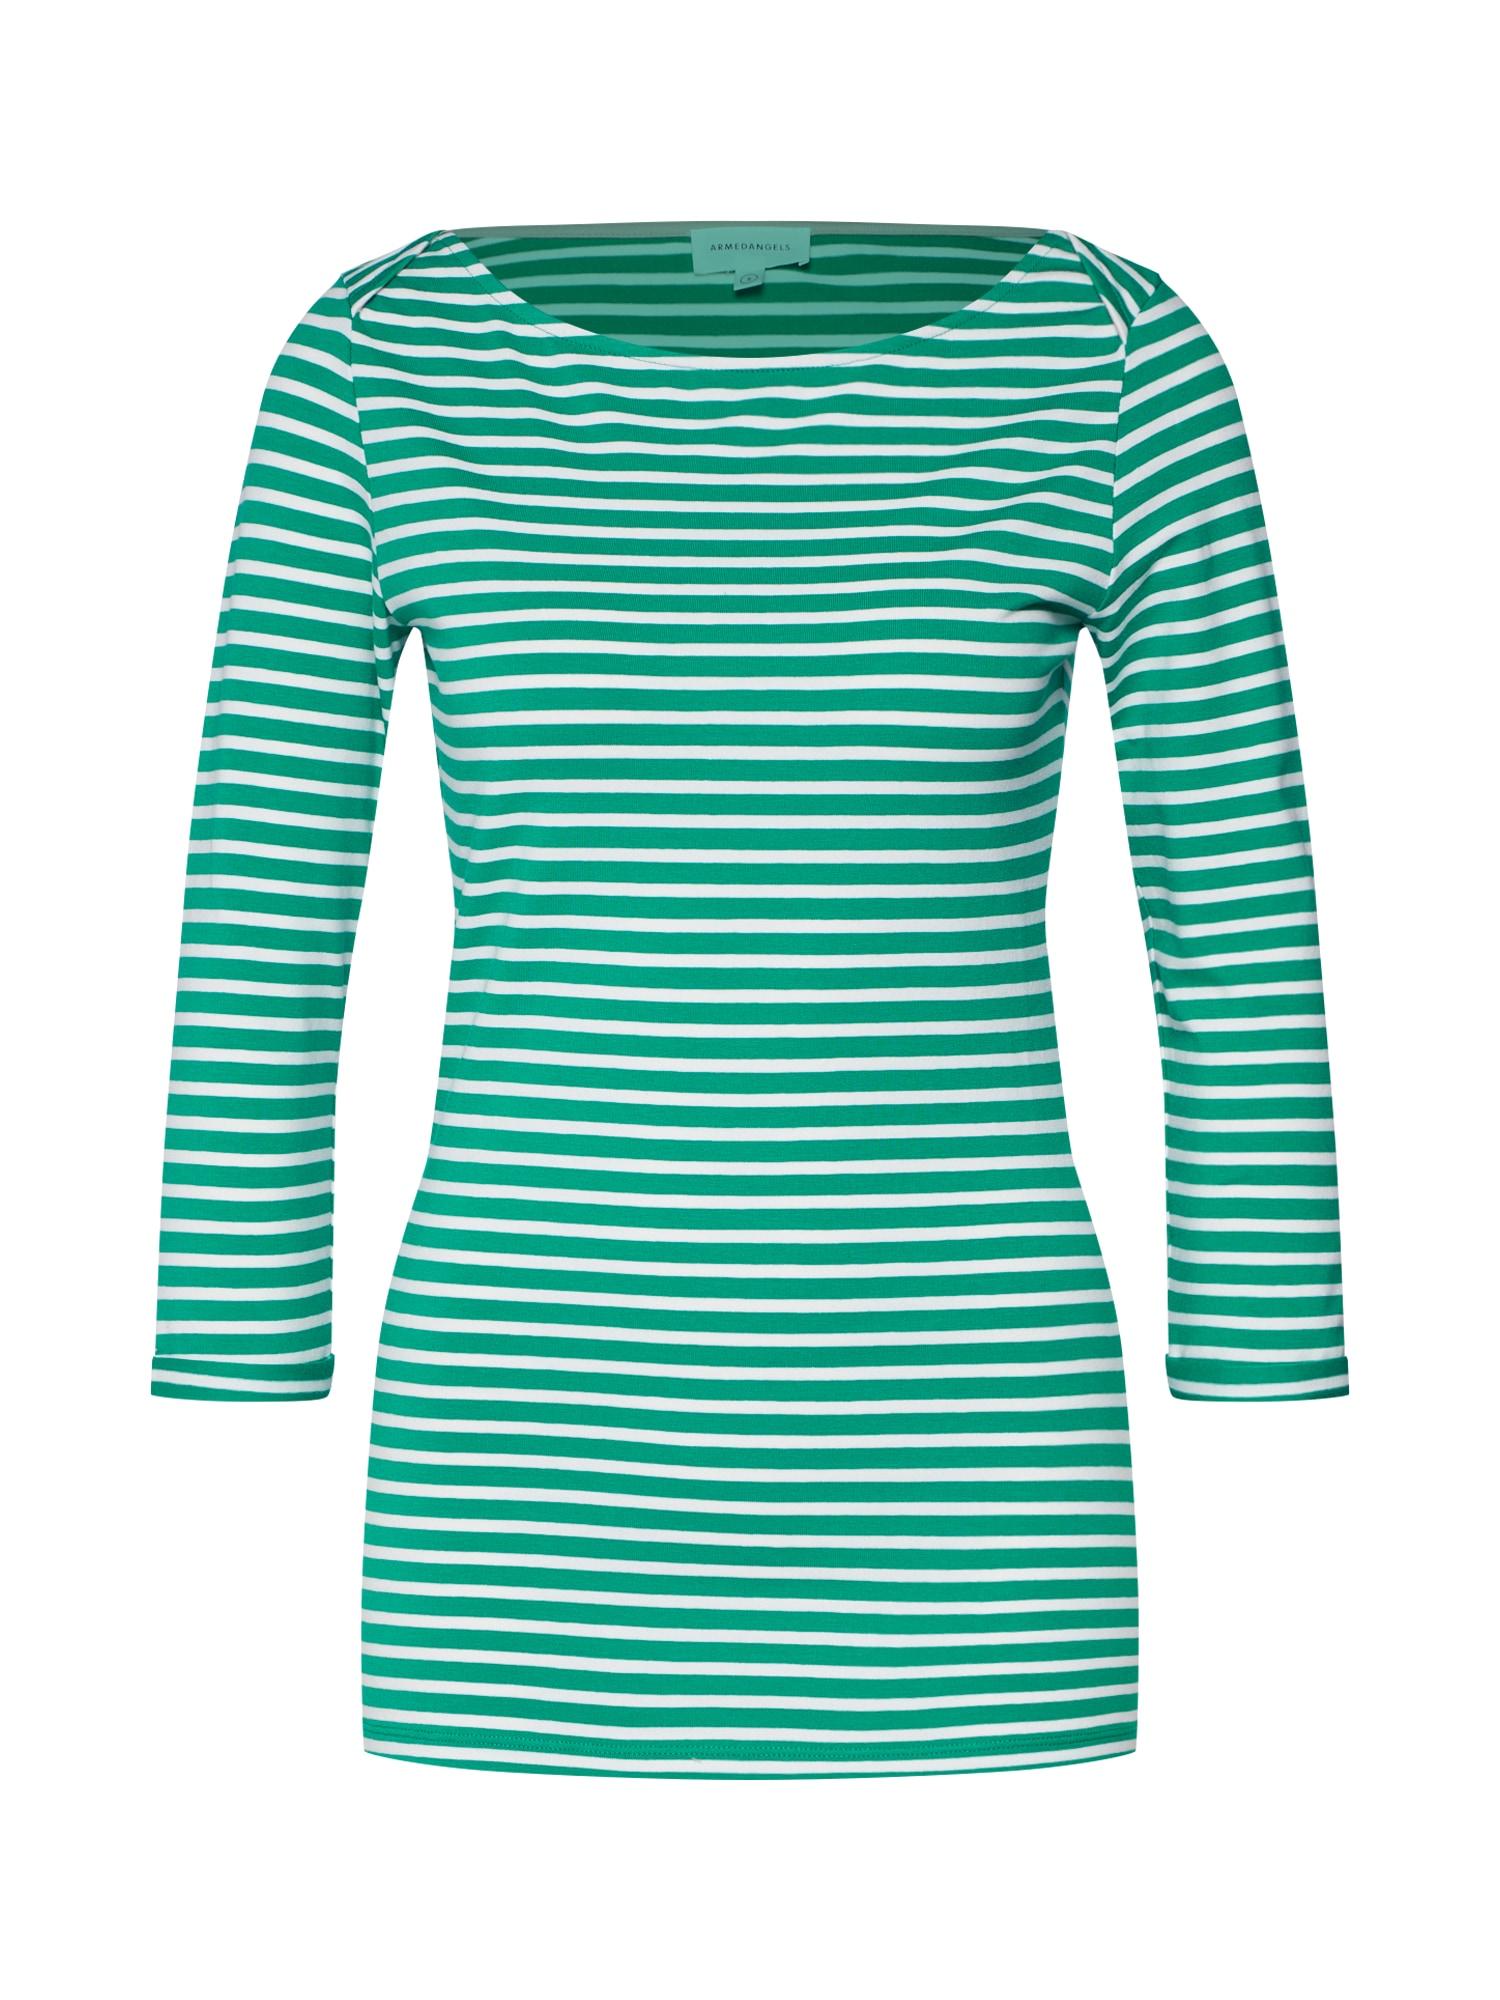 Tričko DALENAA STRIPES zelená bílá ARMEDANGELS